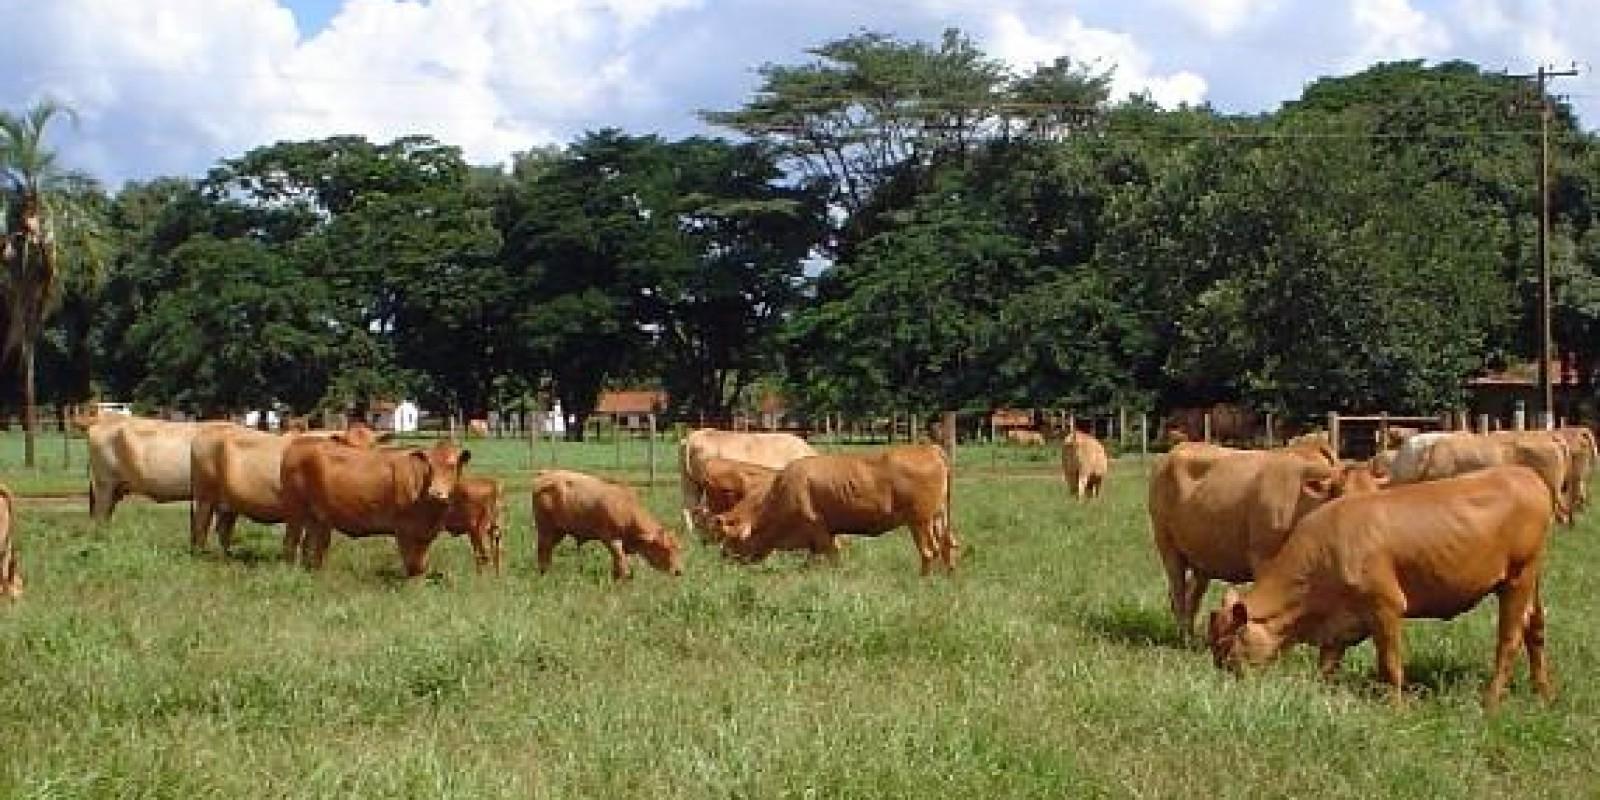 Instituto de Zootecnia quer decodificar genoma de animais adaptados ao clima tropical